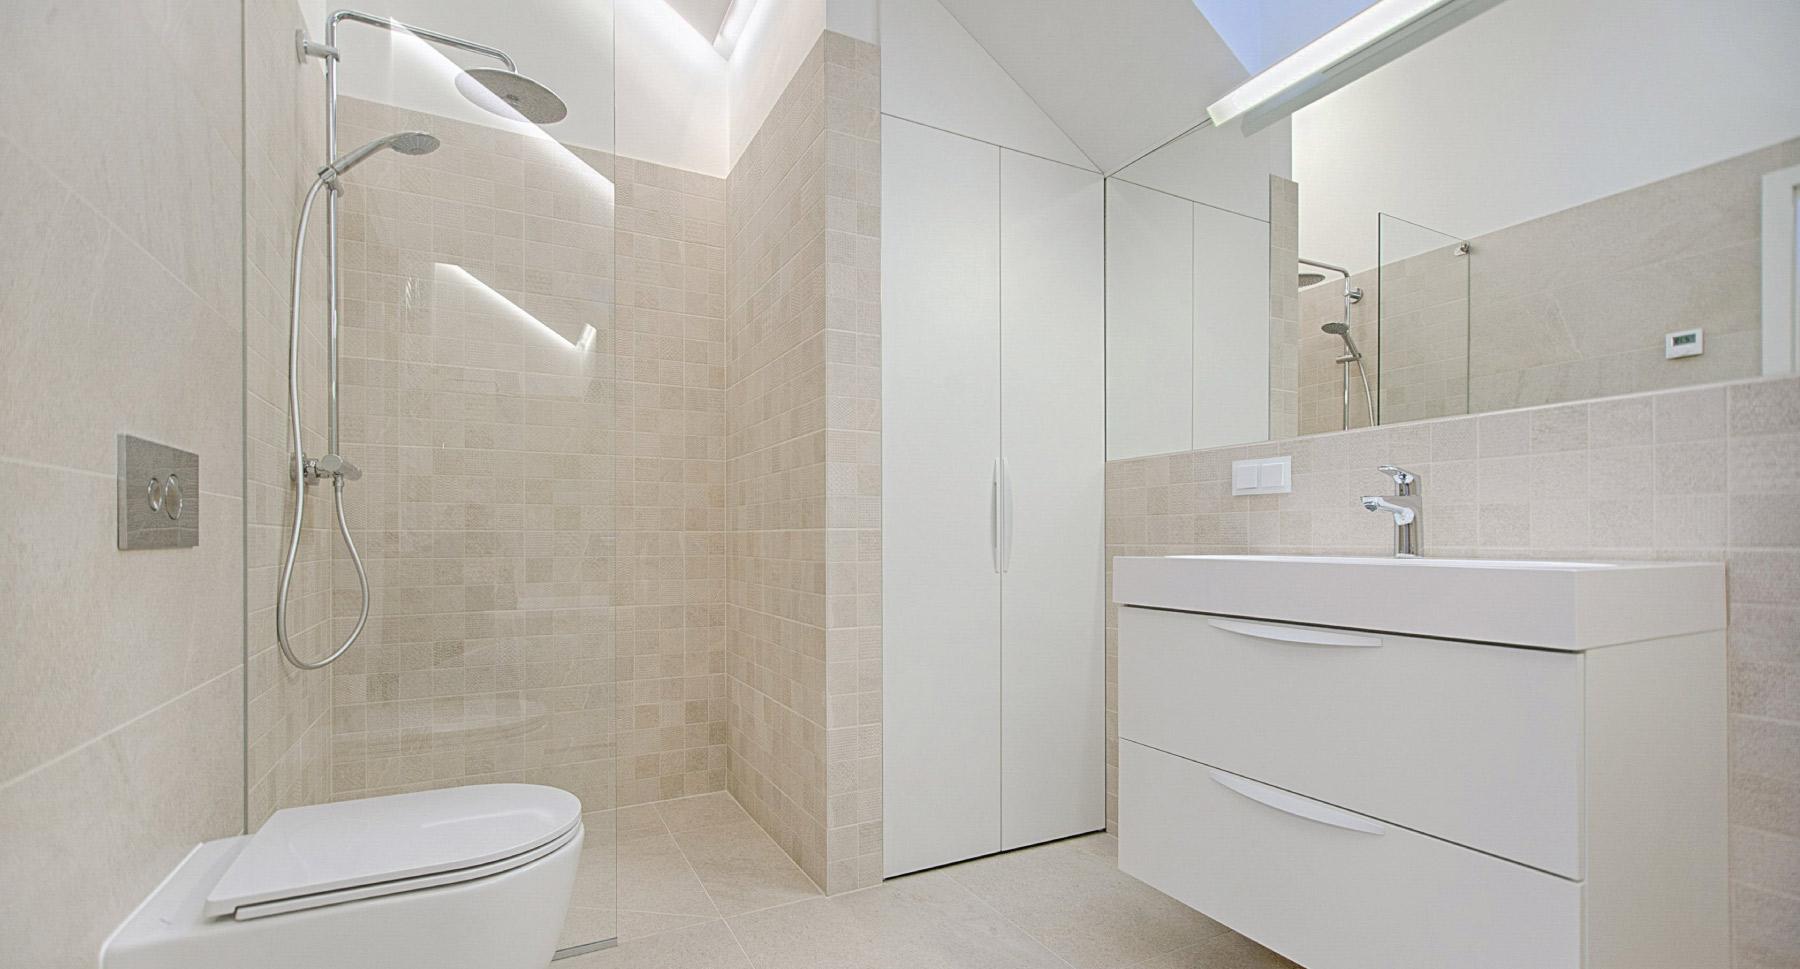 Bathroom refurbishment in London